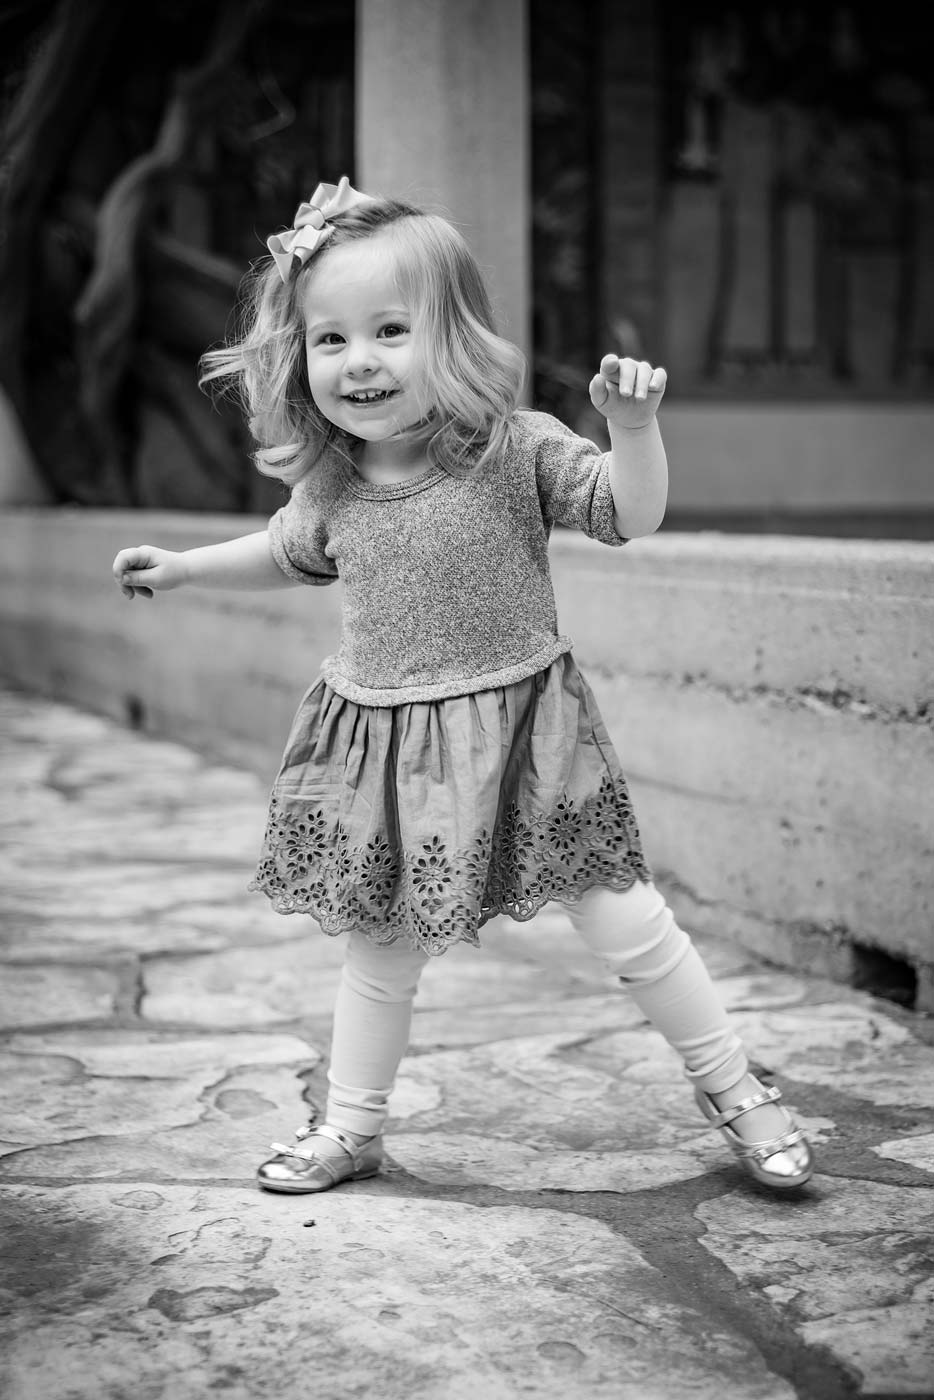 sMiss-Emma-and-Family---2-Years---Jan-2016-70.jpg